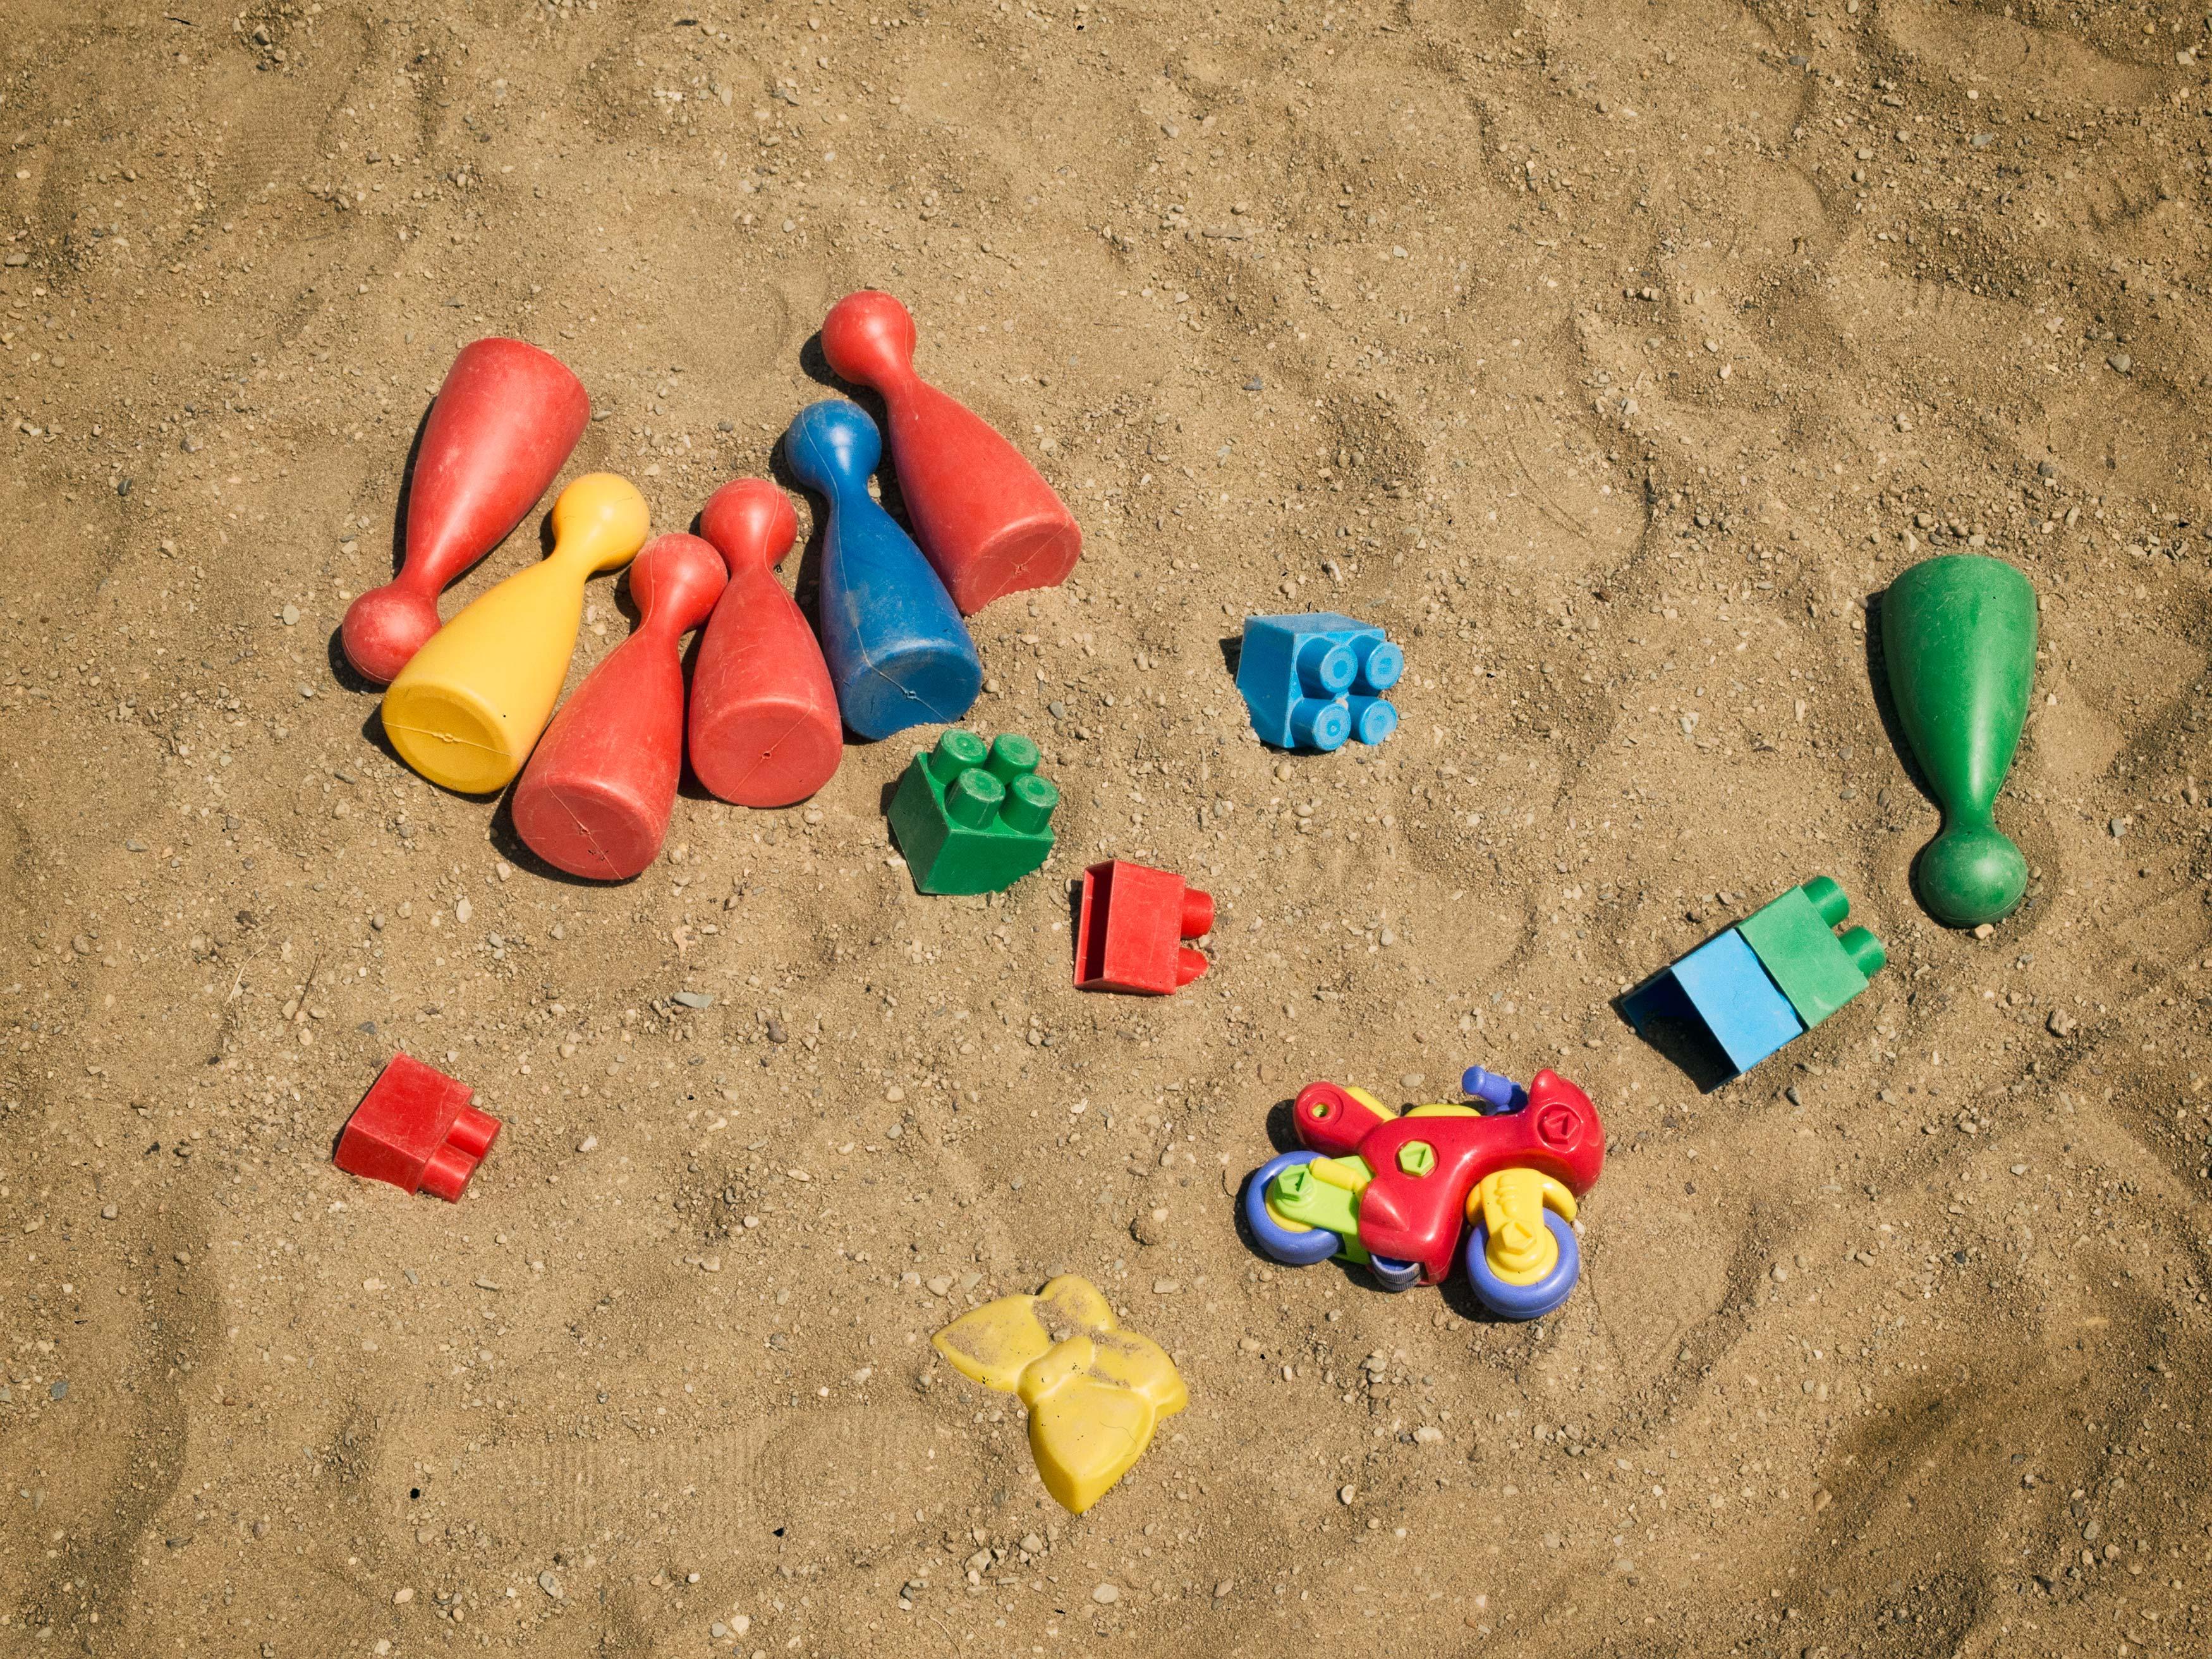 Free Image Toys In The Sandbox Libreshot Public Domain Photos